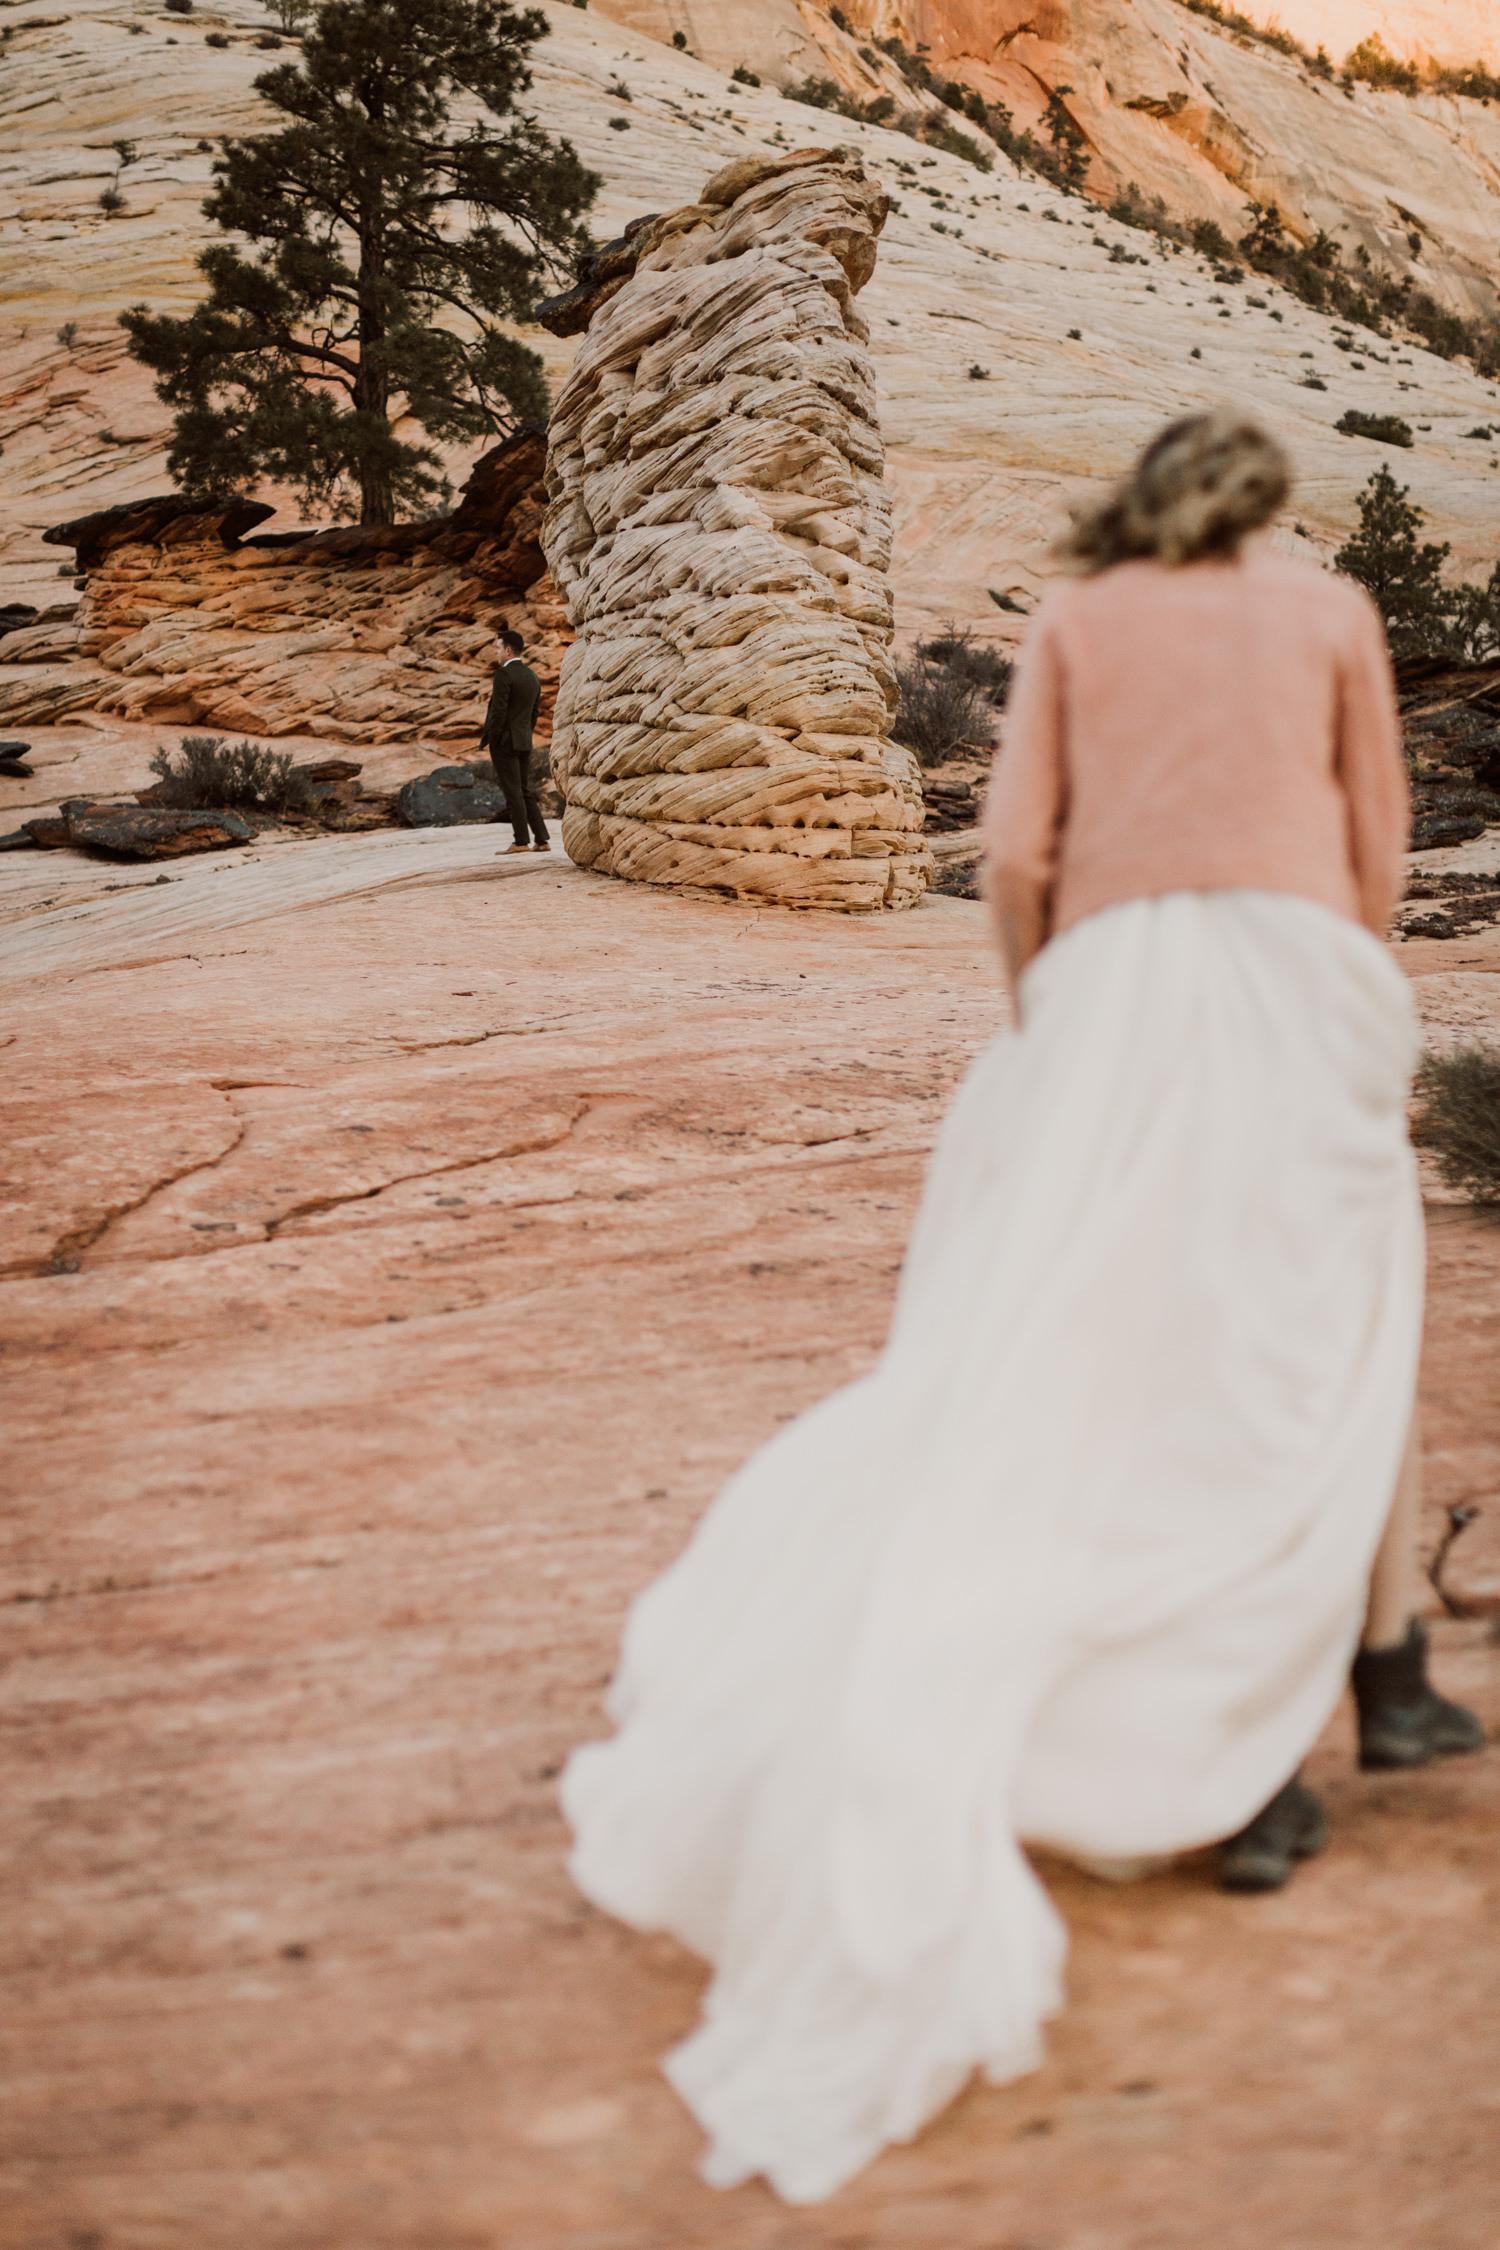 zion-national-park-wedding-26.jpg